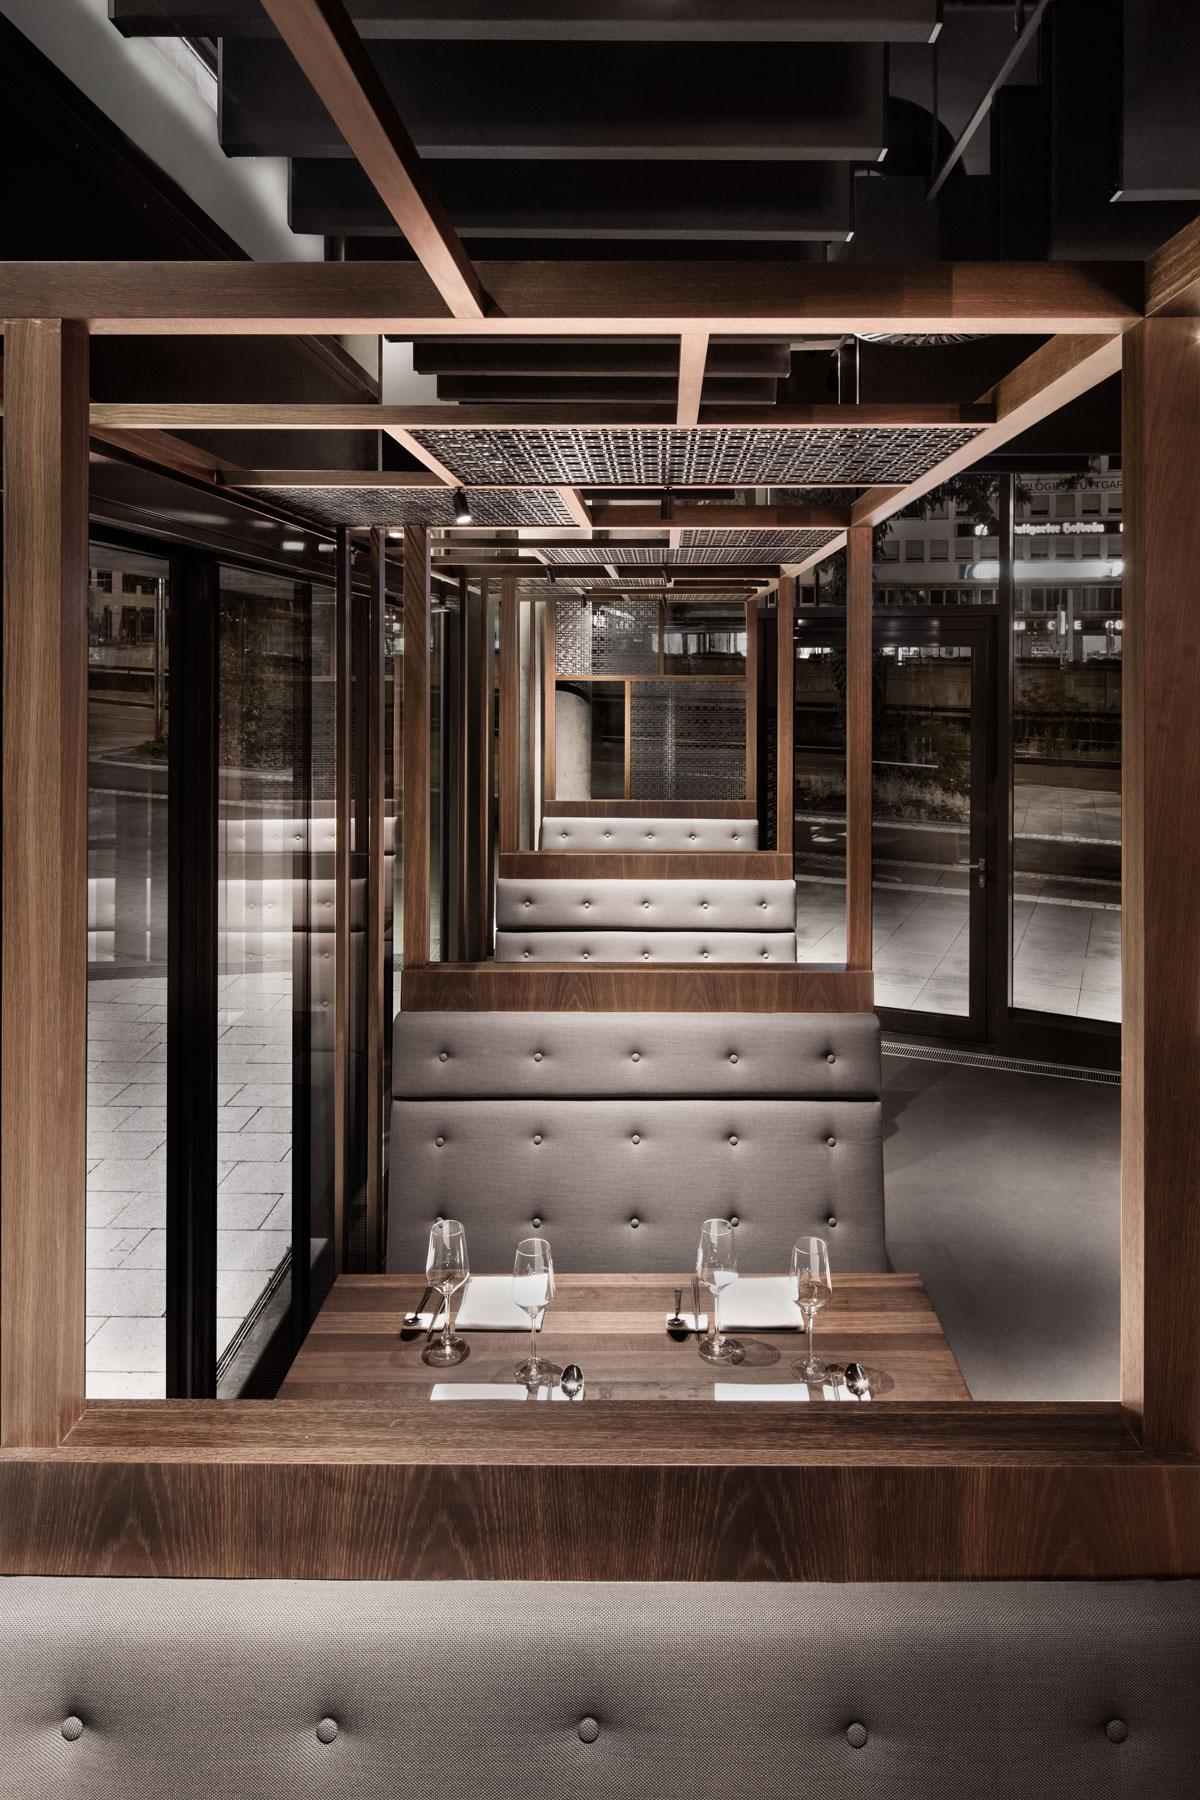 Enso Sushi & Grill, Durchblick Sitzecke